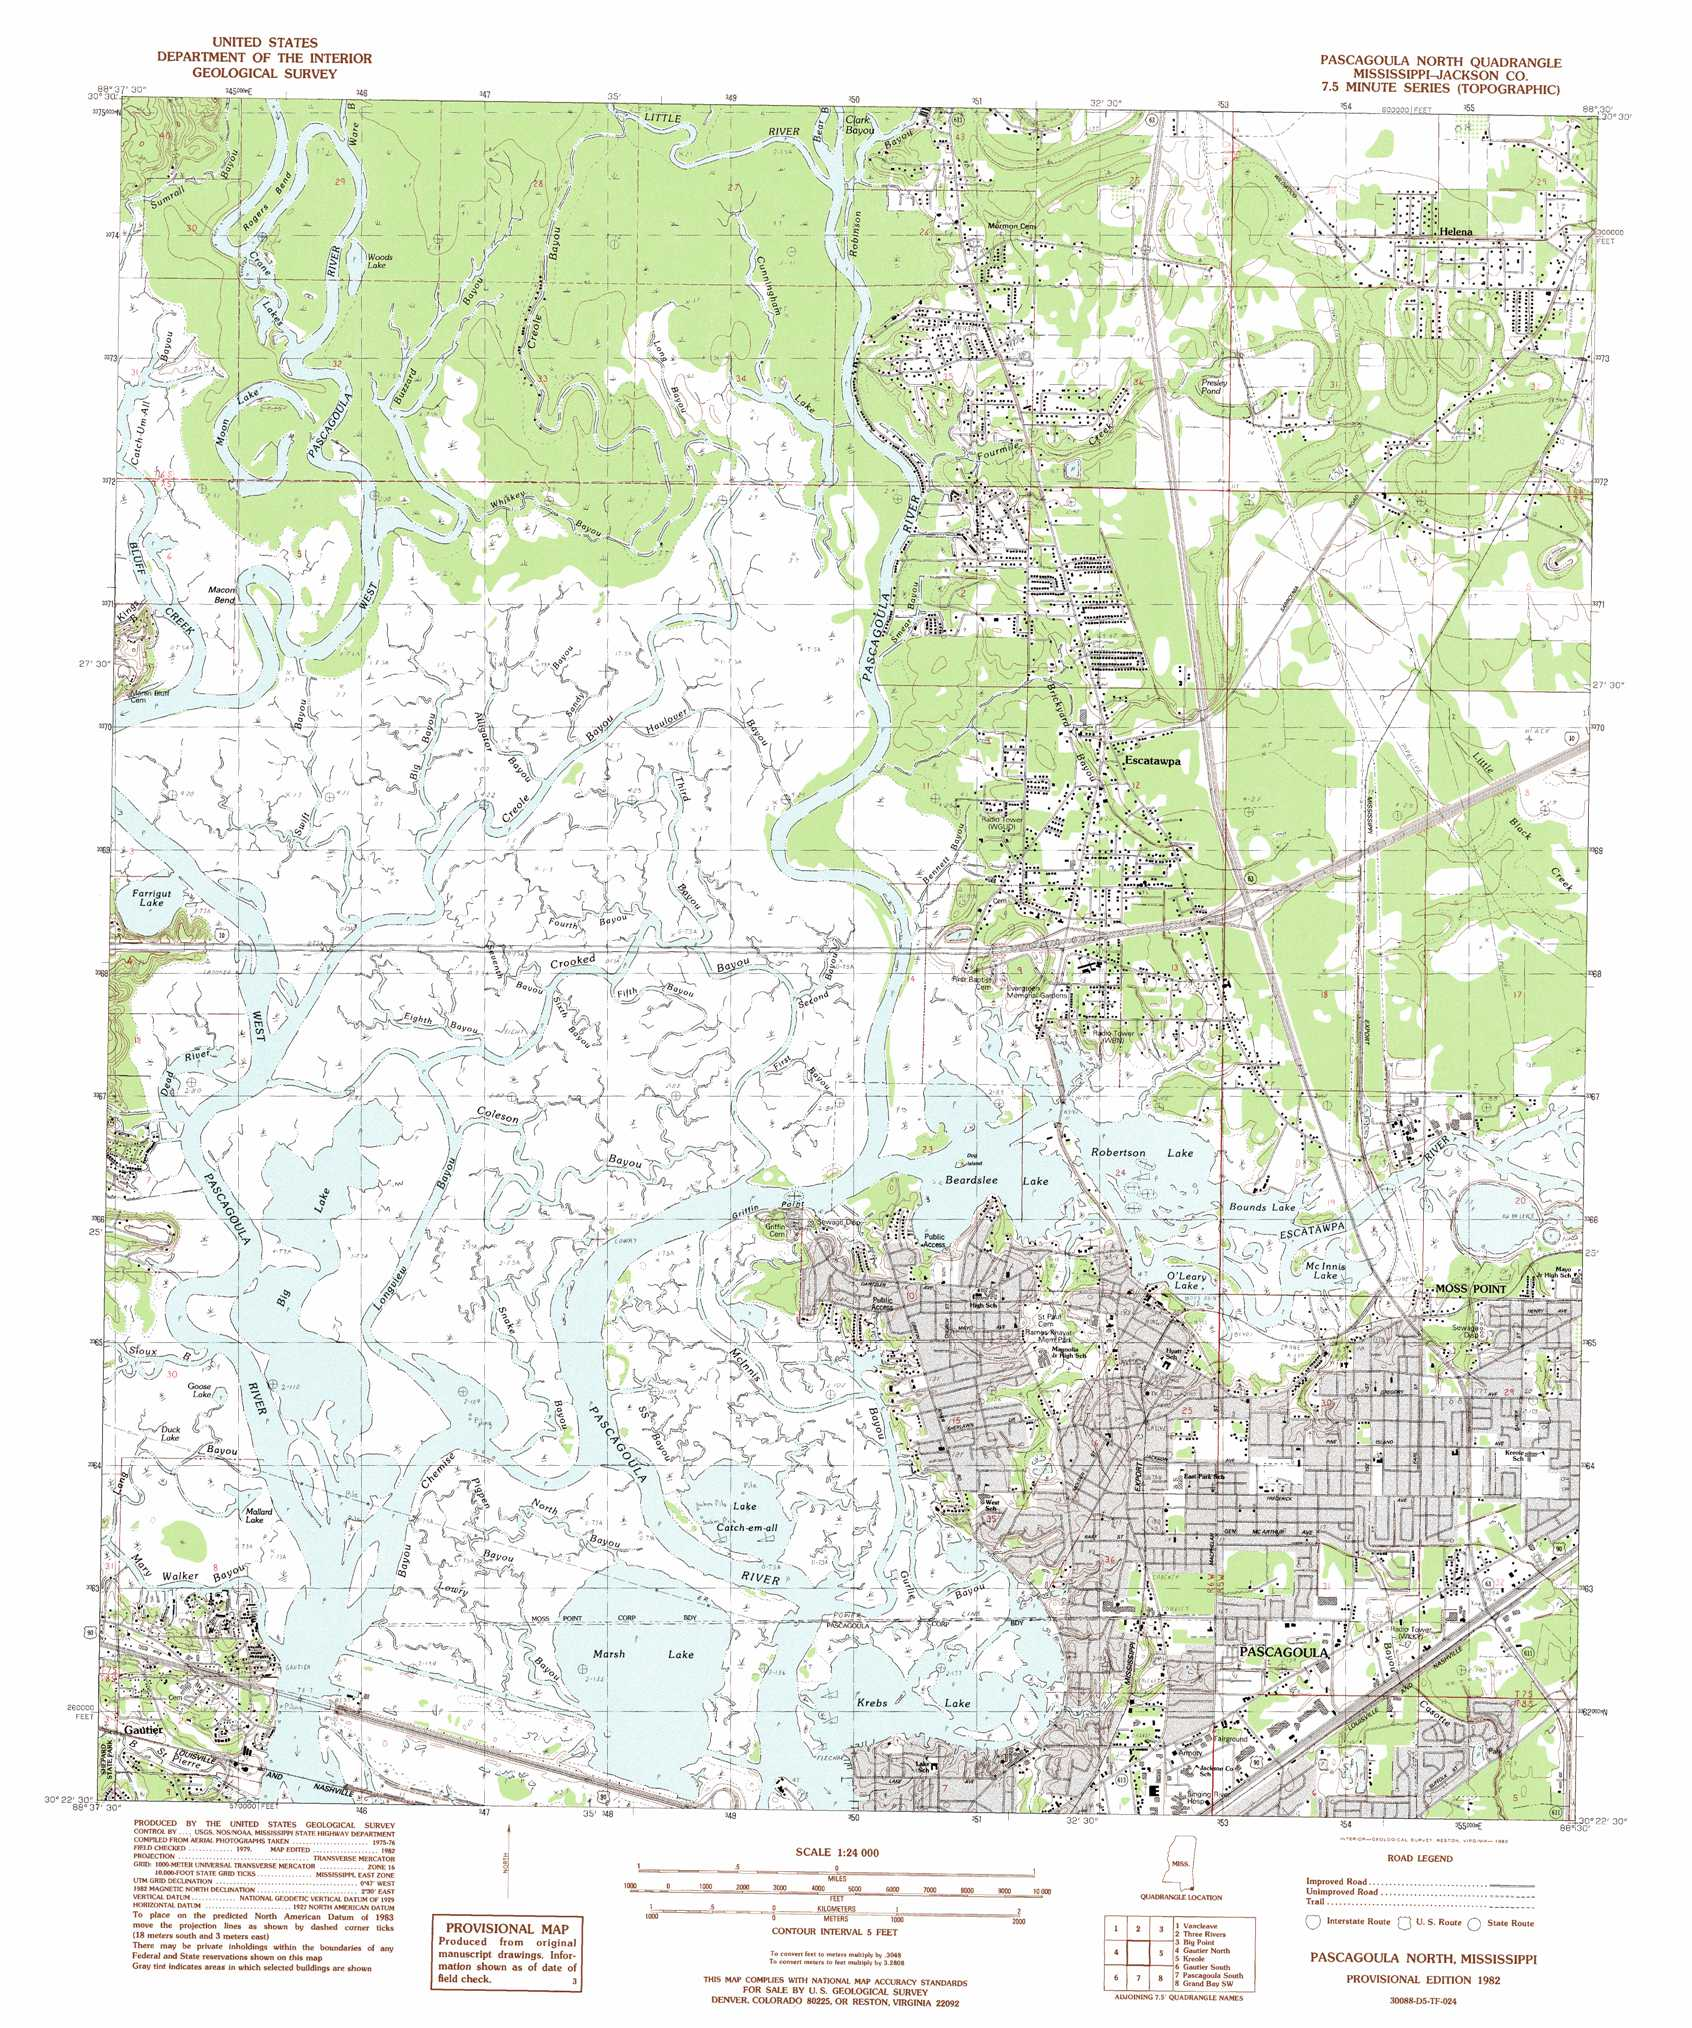 Pascagoula North Topographic Map MS  USGS Topo Quad 30088d5